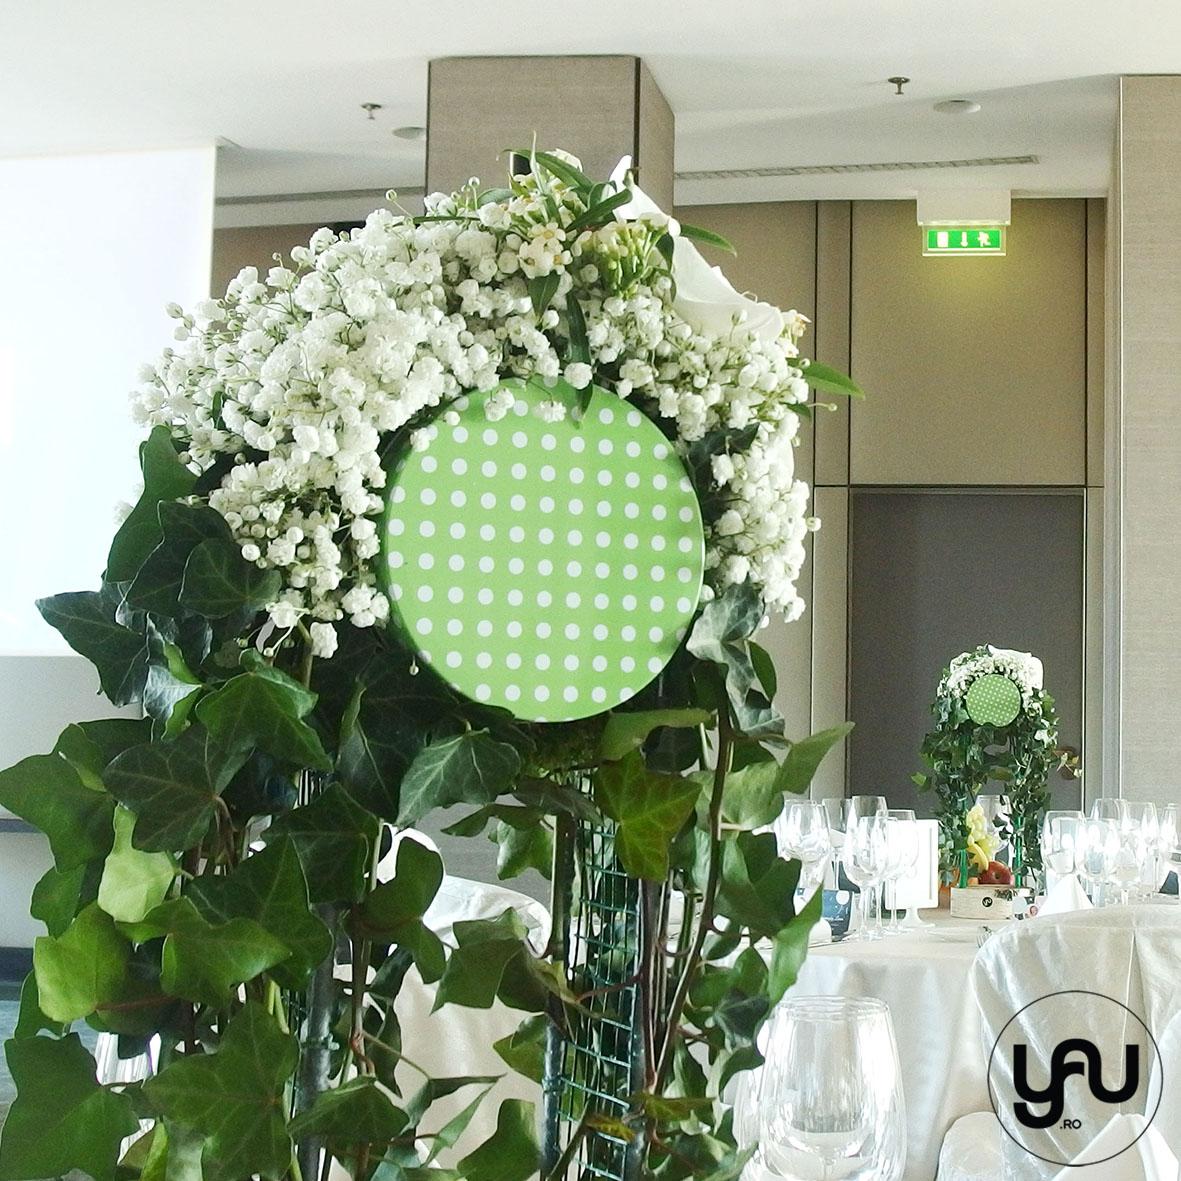 nunta-si-botez-cu-flori-albe-linie-punct-_-yau-events-2016-_-hotel-intercontinental-_-elenatoader-23